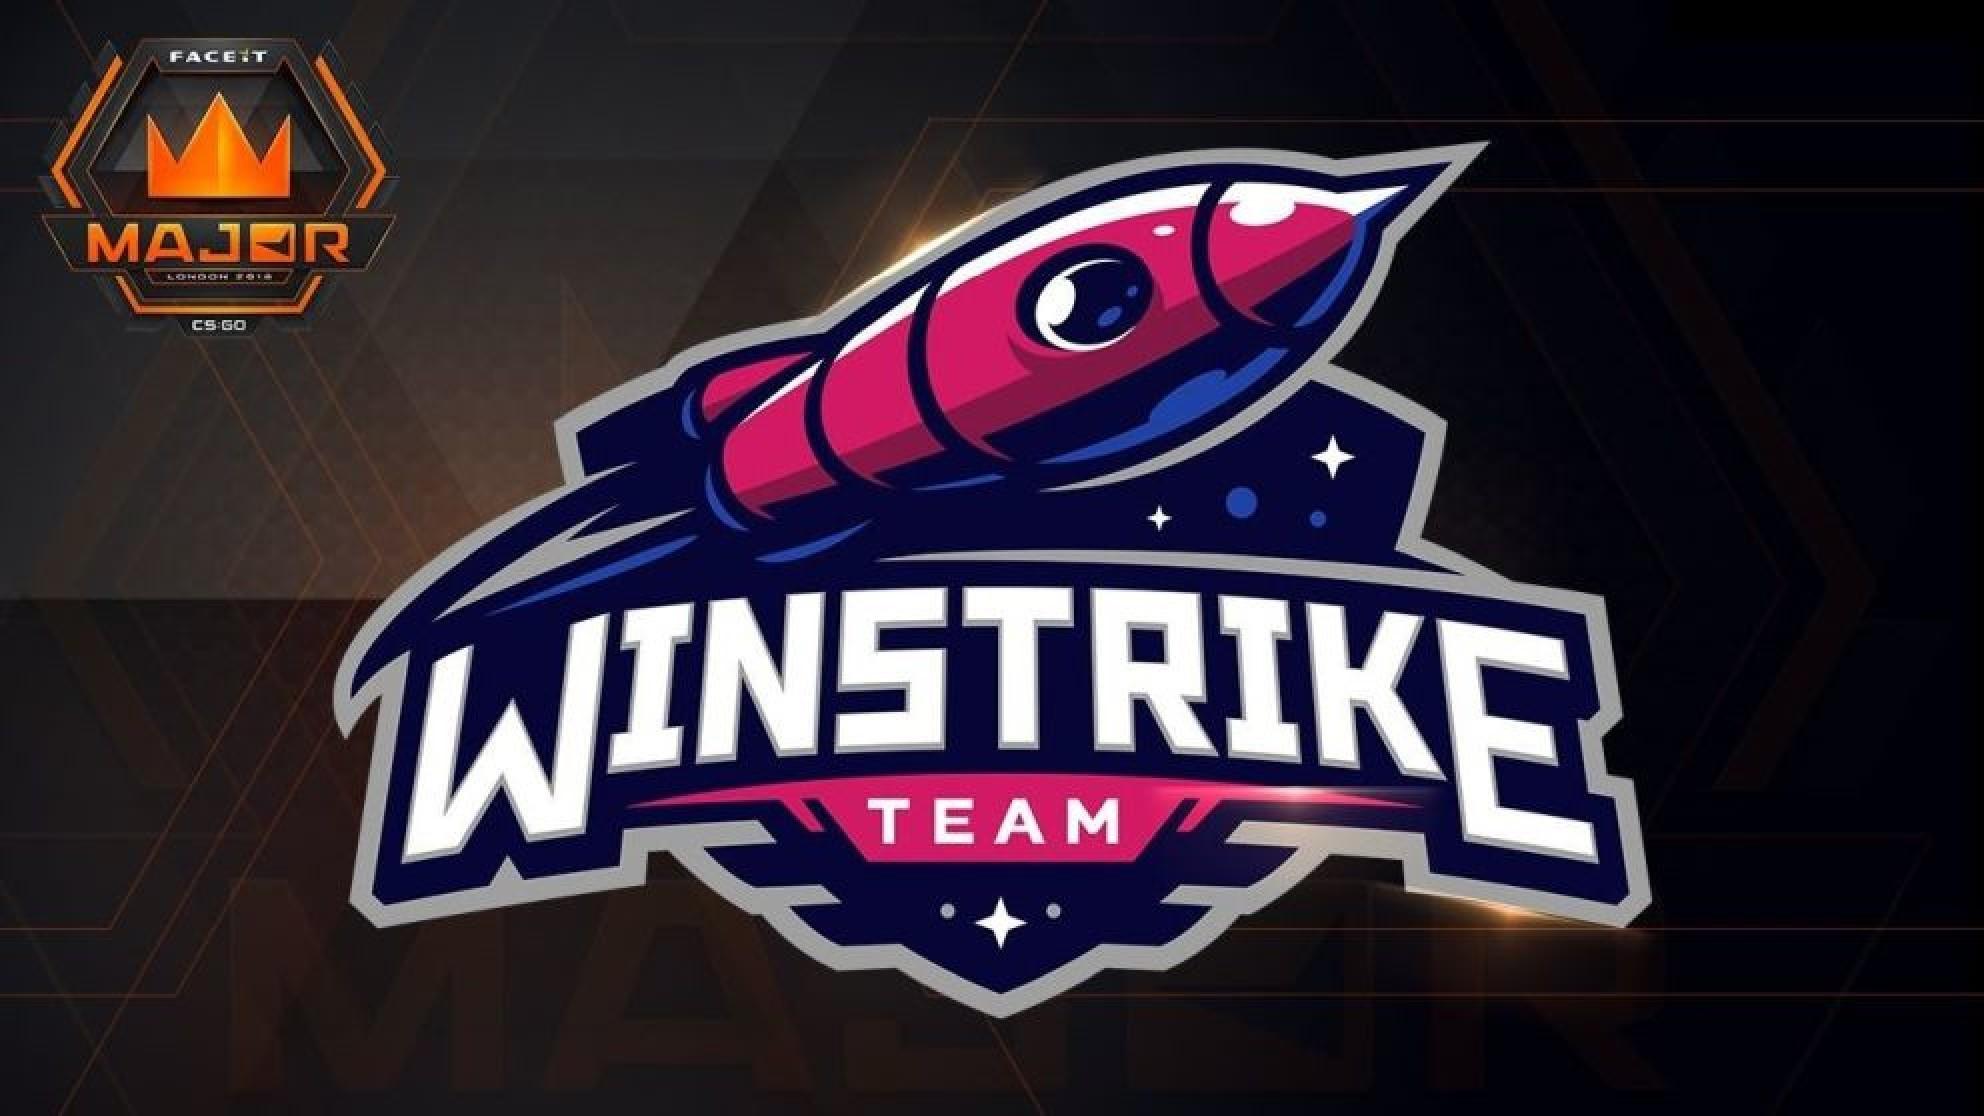 Winstrike rebuild their CS:GO roster